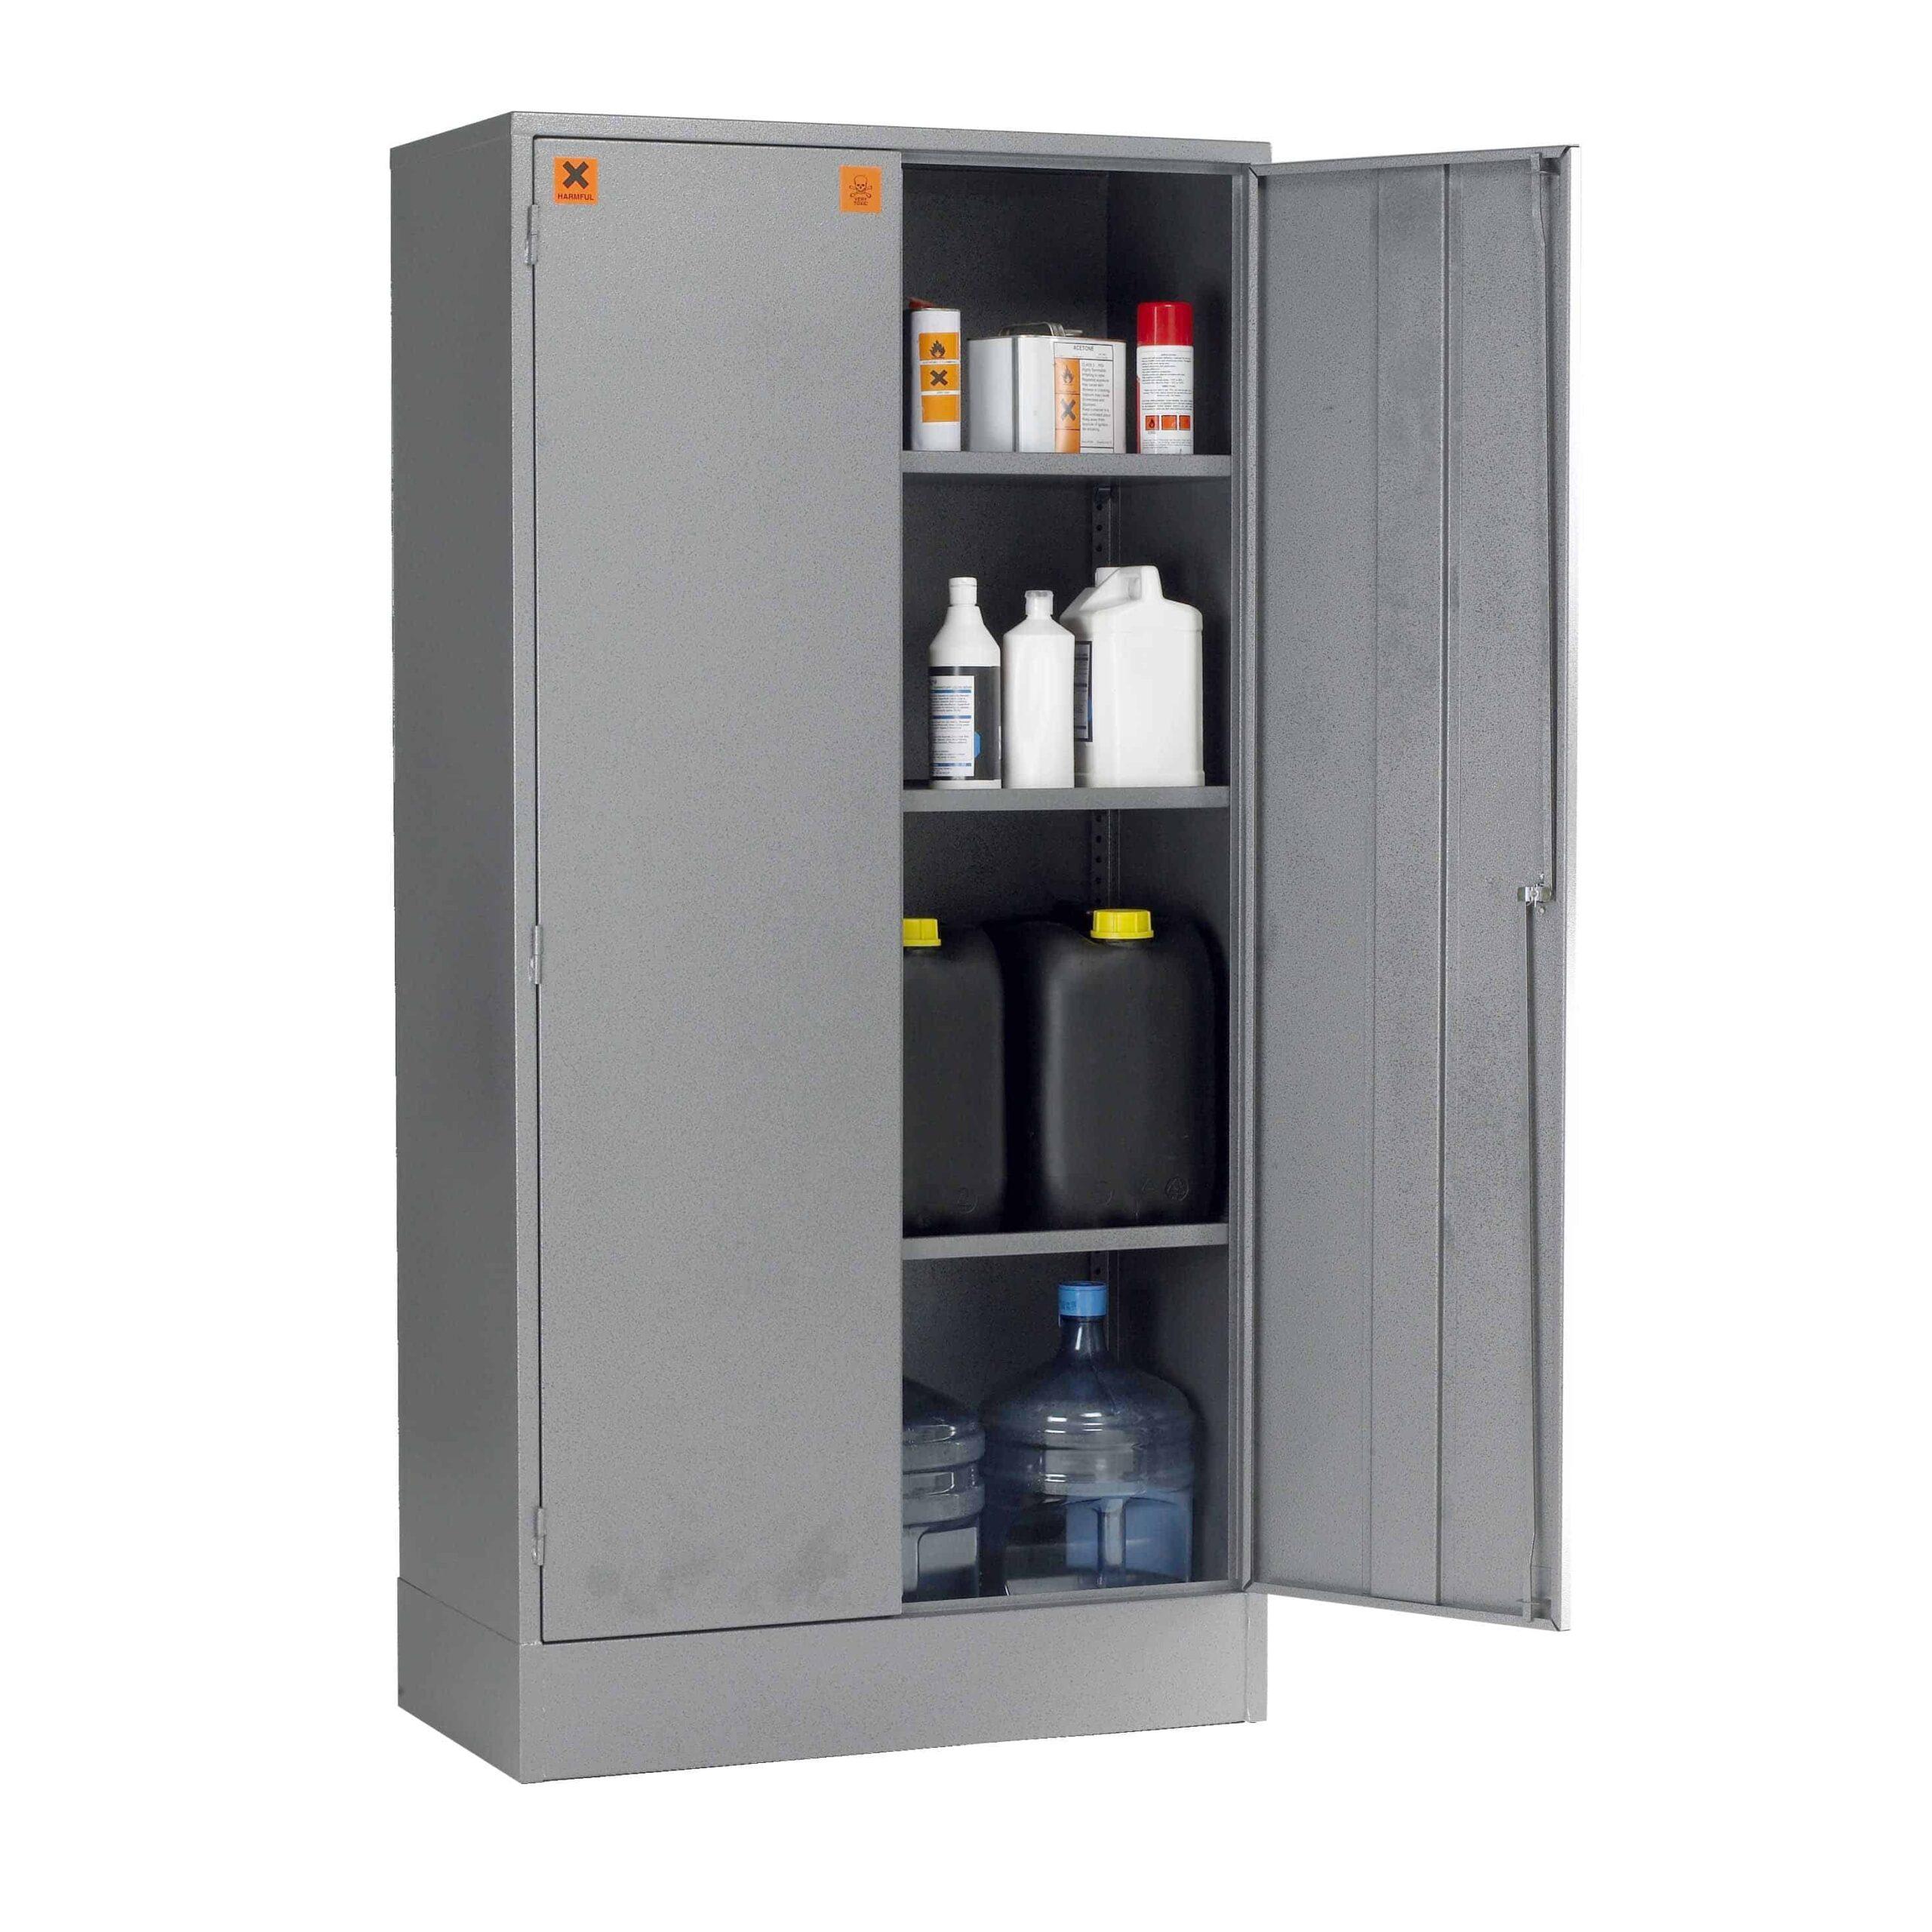 SU08C COSHH Storage Cabinets